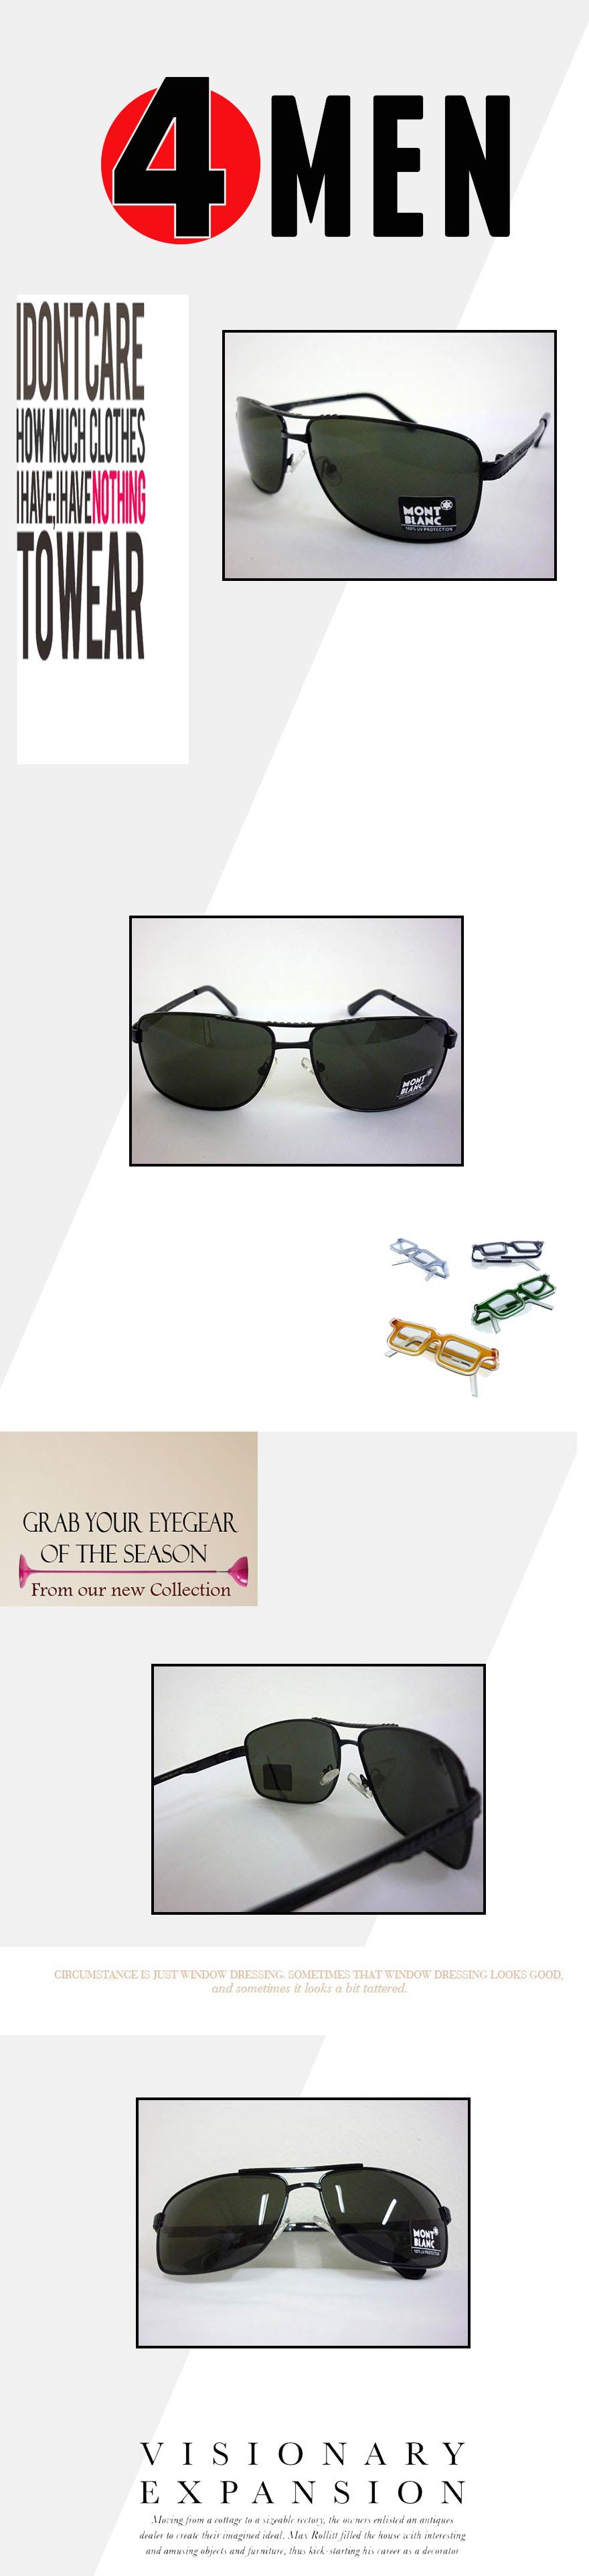 Mắt kính nam đen mont blanc mkf006 - 1